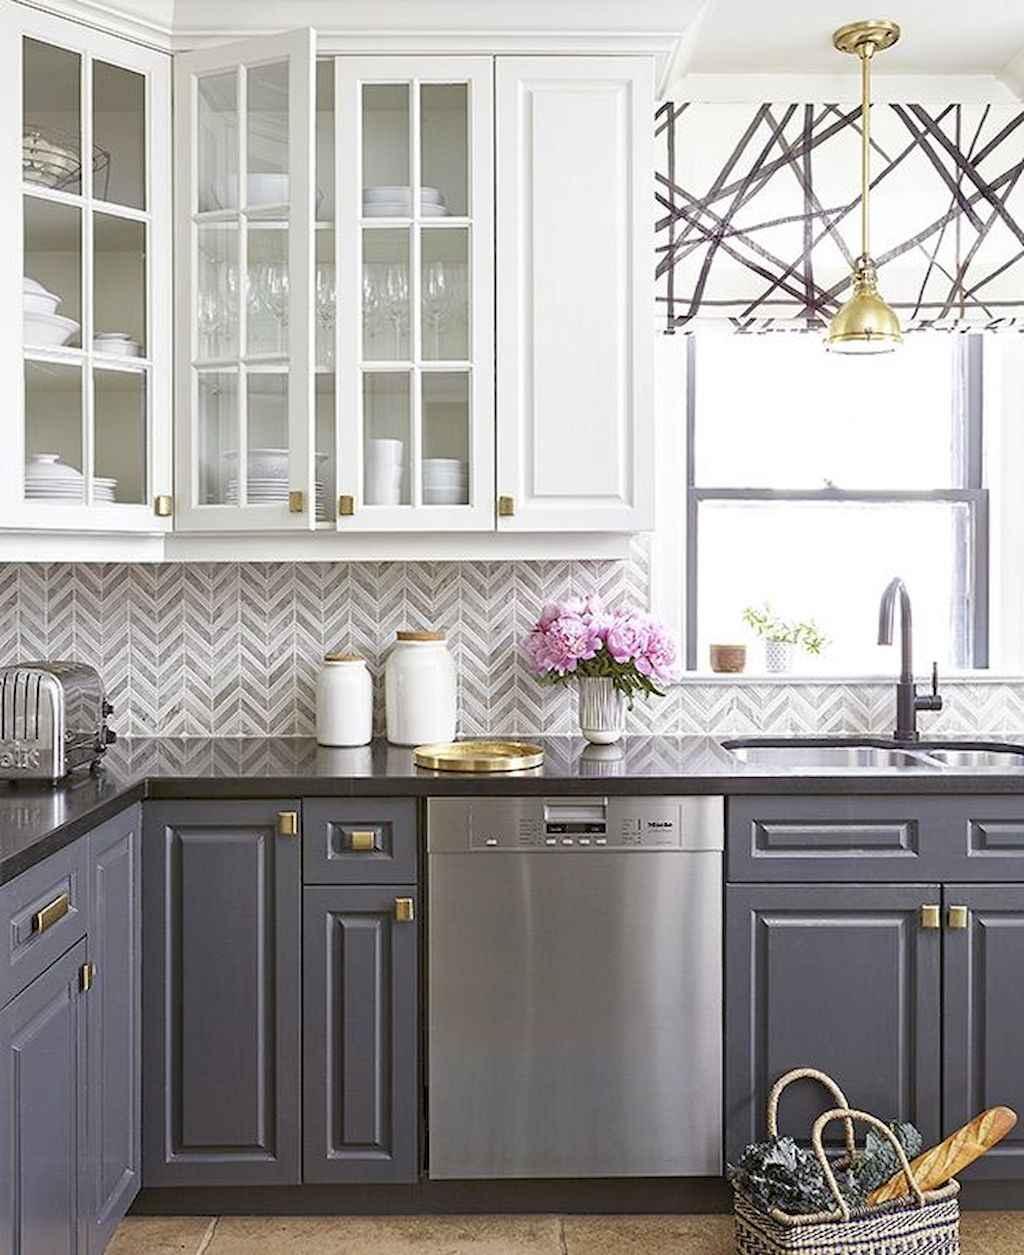 24 Grey Kitchen Cabinets Designs Decorating Ideas: 85 Gorgeous Gray Kitchen Cabinet Design Ideas